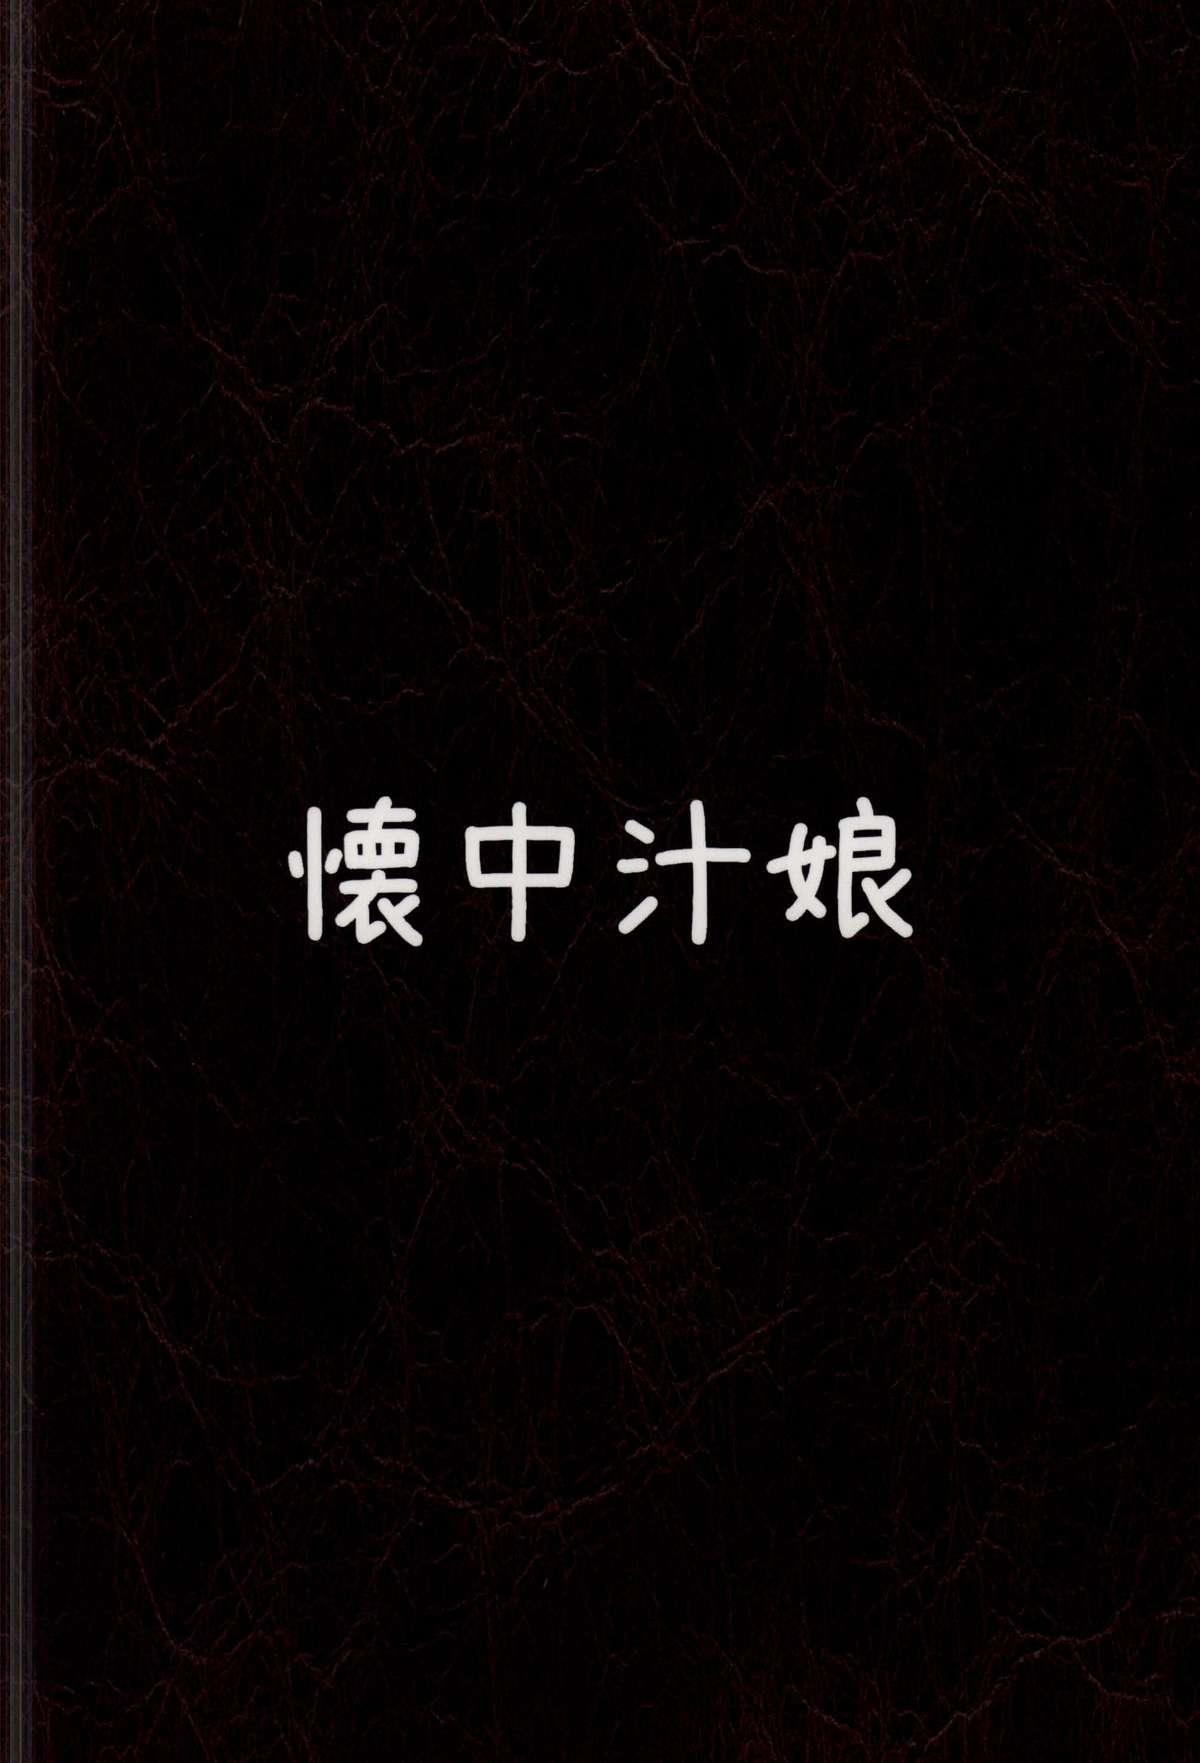 Hacchan Kaimen desu yo- 27